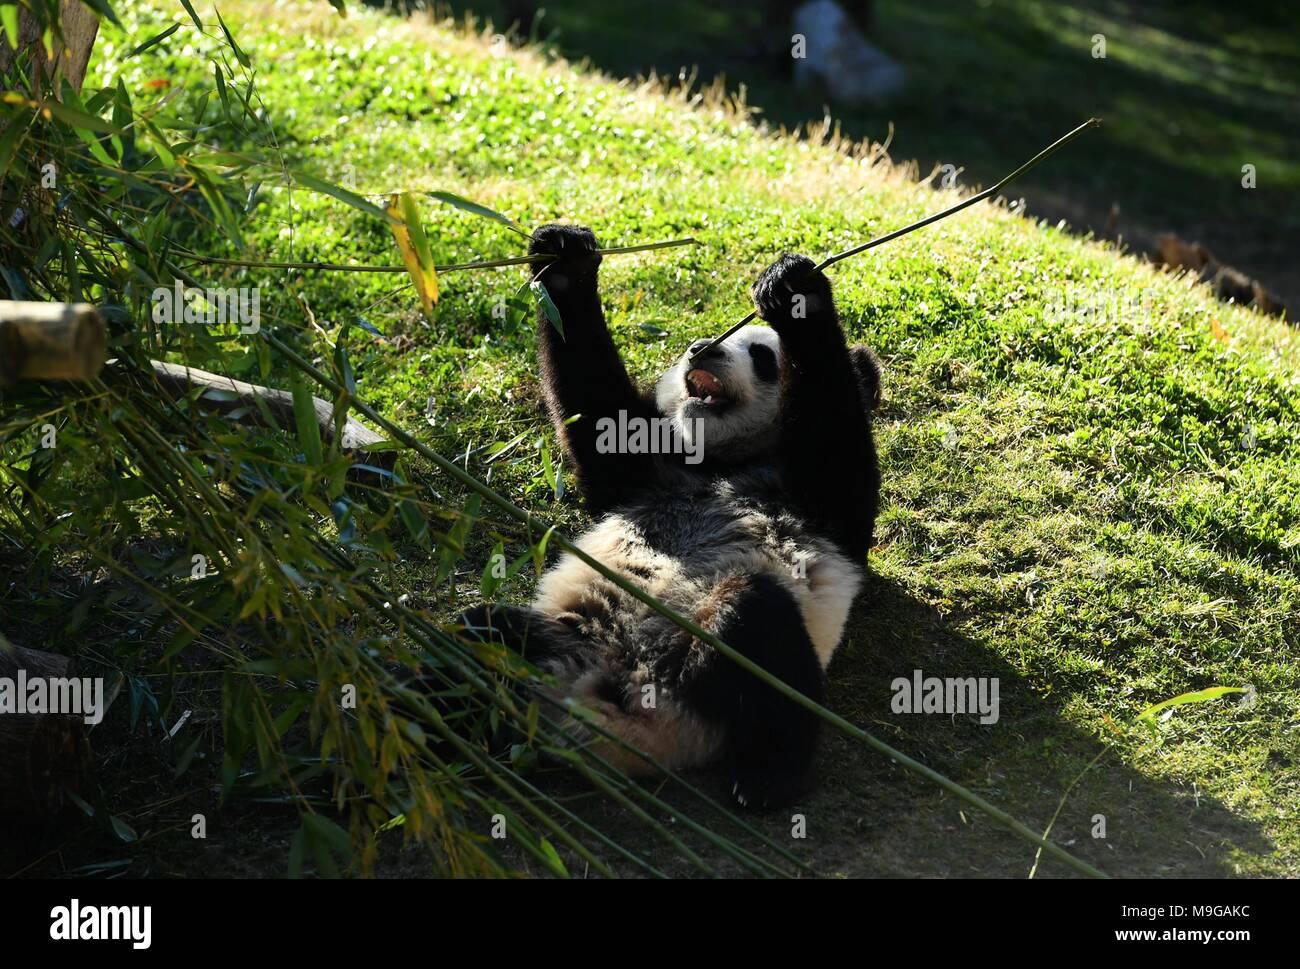 180326 Madrid 26 Marz 2018 Xinhua Die Baby Panda Chulina